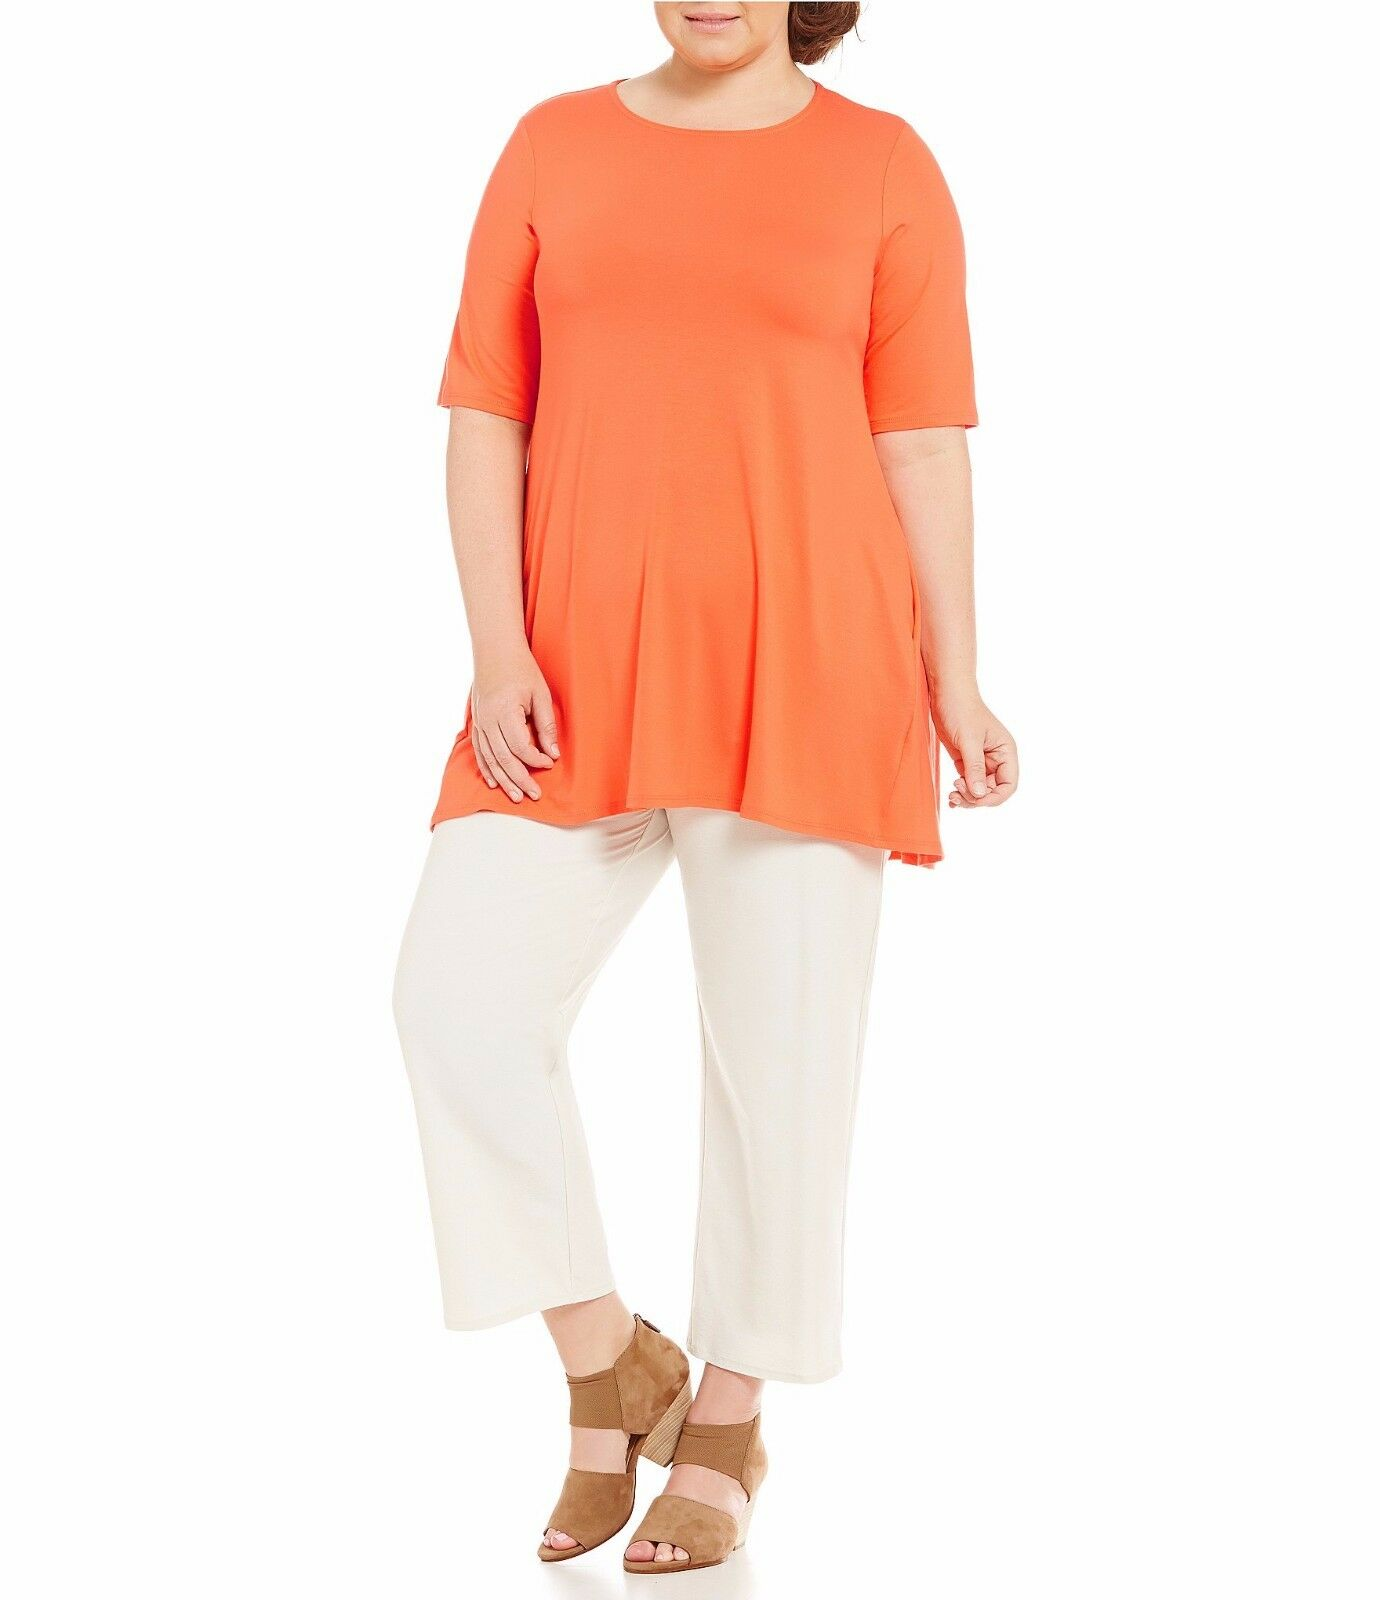 NWT Eileen Fisher Roundneck Tunic Viscose Jersey Orange Guava  – 1X, 2X